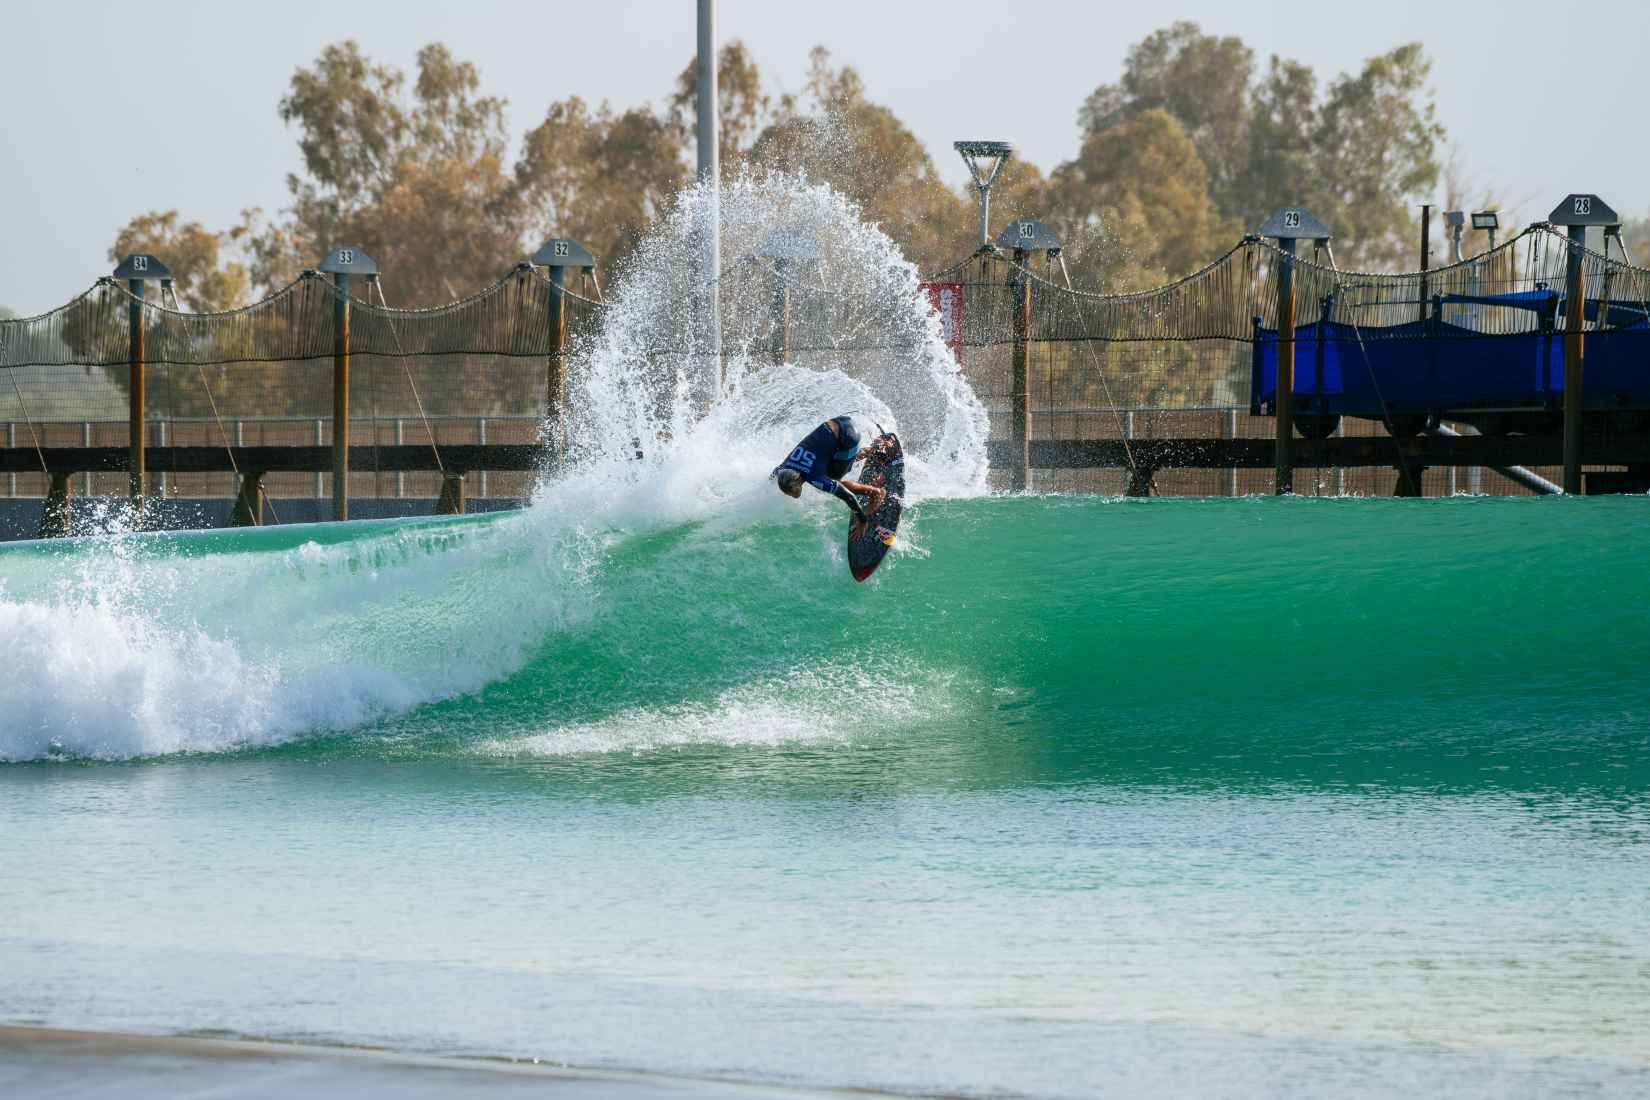 surf30 surf ranch pro 2021 wsl surf Igarashi K Ranch21 PNN 1515